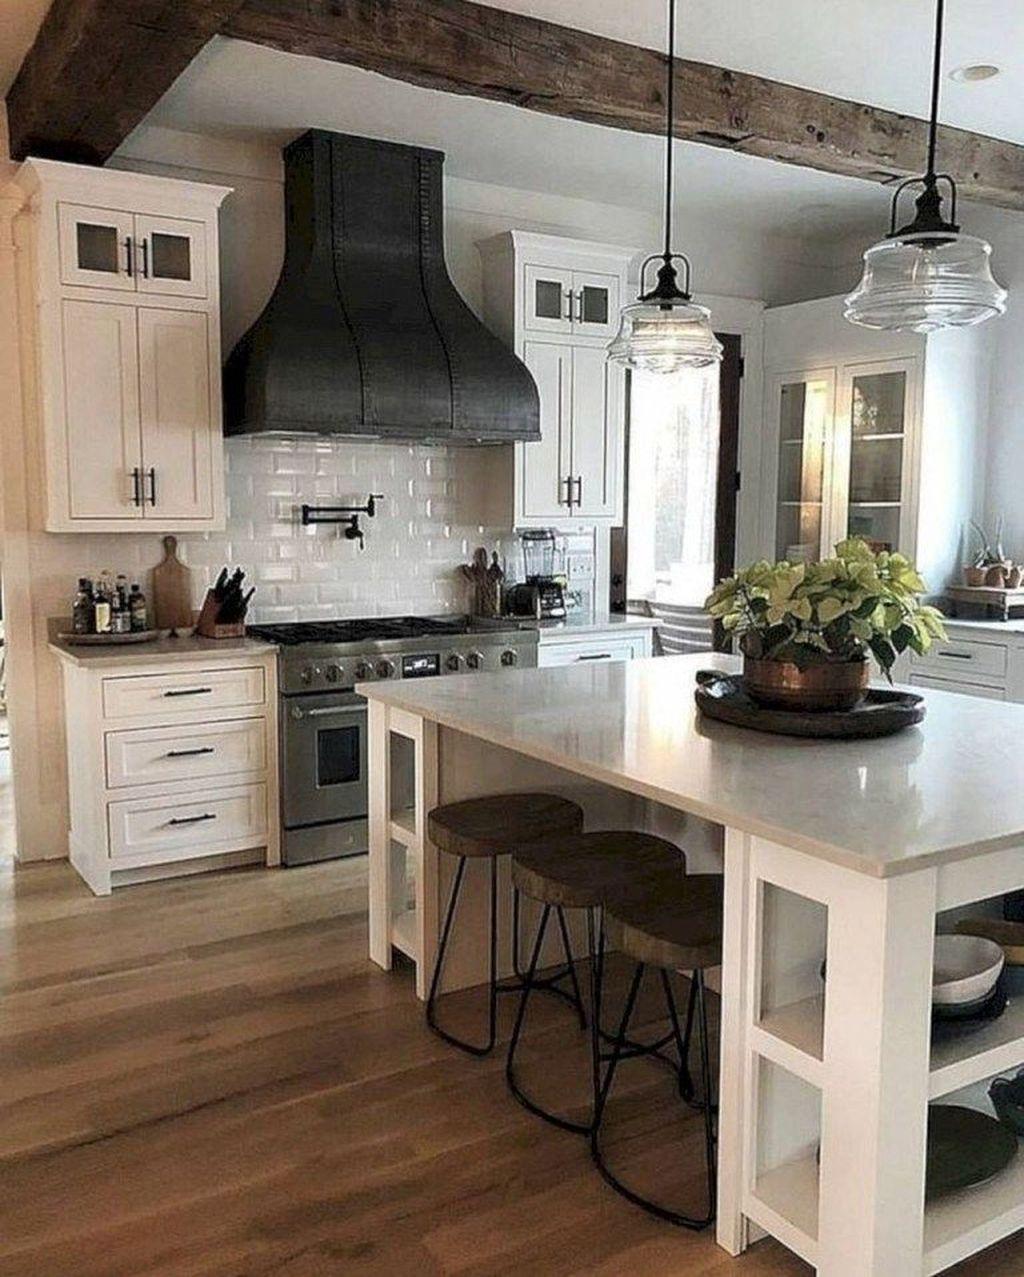 Amazing Remodeling Farmhouse Kitchen Decorations 31 ...